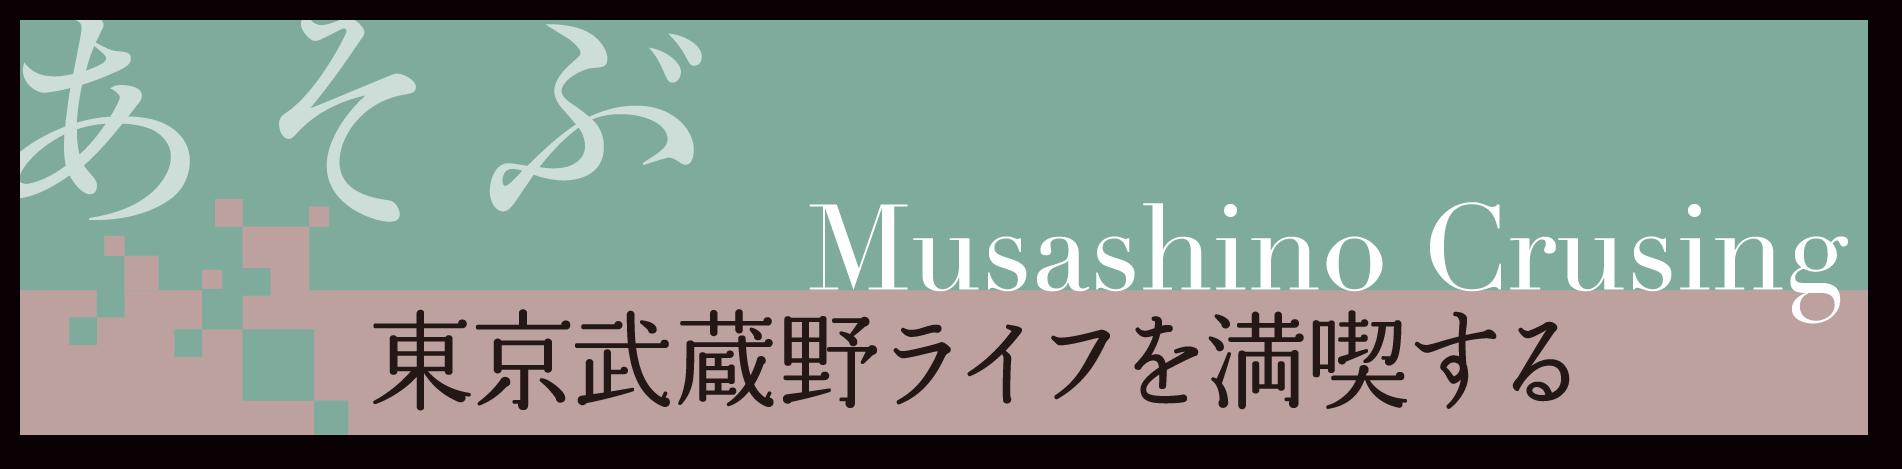 Banner_04_asobu 2.png